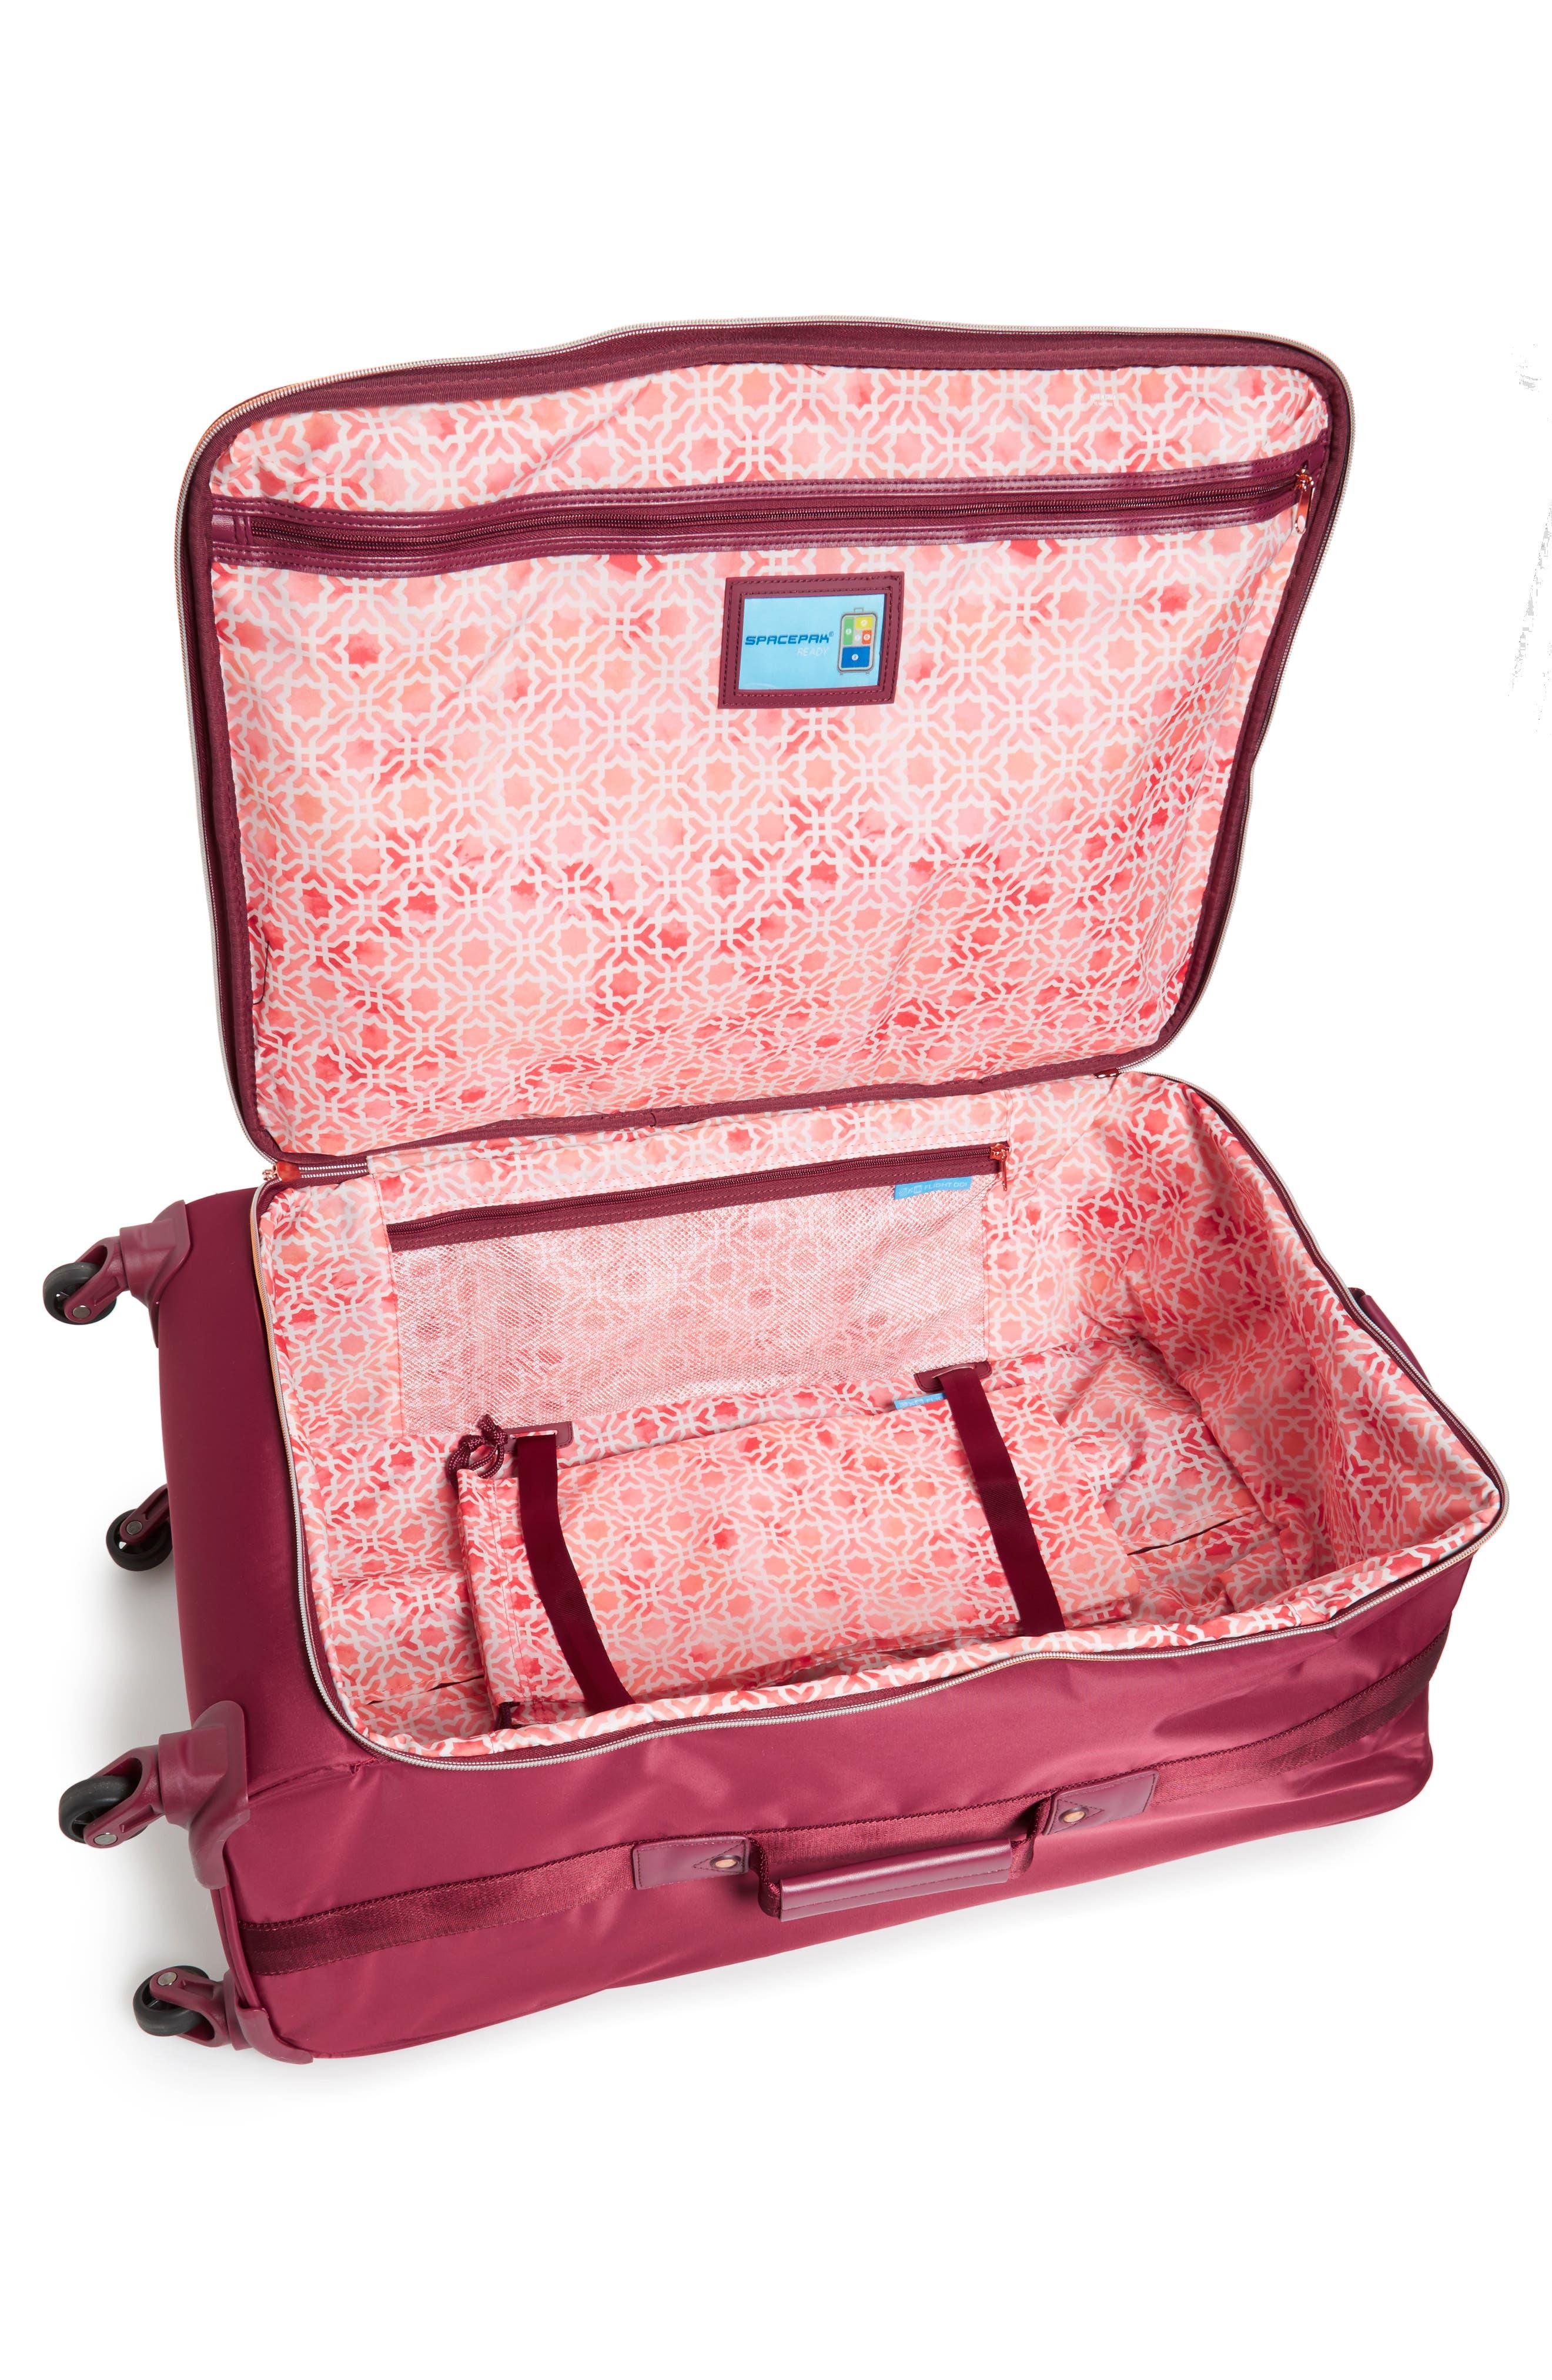 Avionette 26-Inch Rolling Suitcase,                             Alternate thumbnail 2, color,                             930